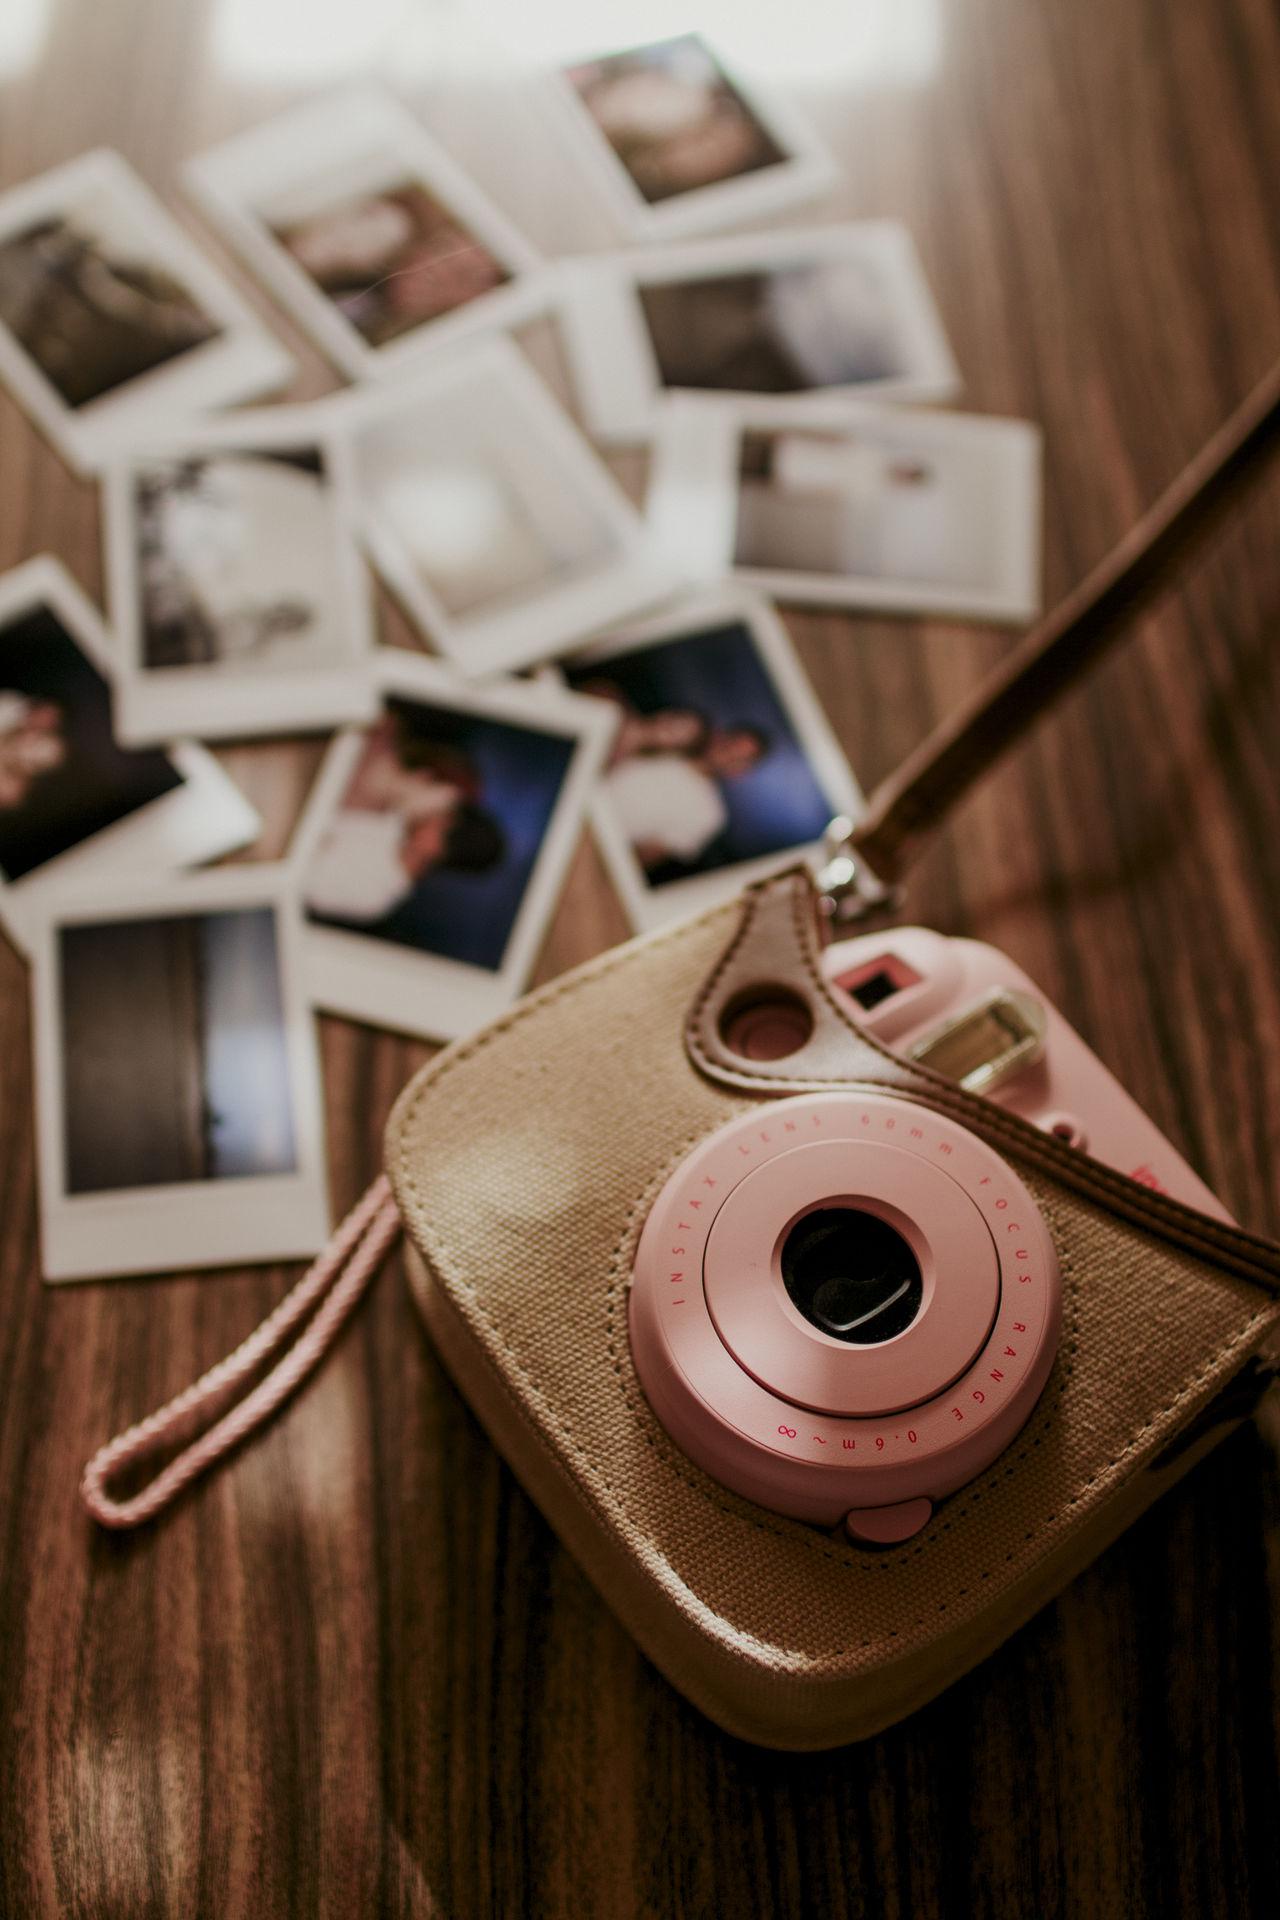 Camera Camera - Photographic Equipment Camera Insta Close-up Day Indoors  Instax Photo Instaxmini Instaxmini8 No People Pink Color Polaroid Vintage Vintage Camera Vintage Cameras Vintage Photo Wood Wood - Material